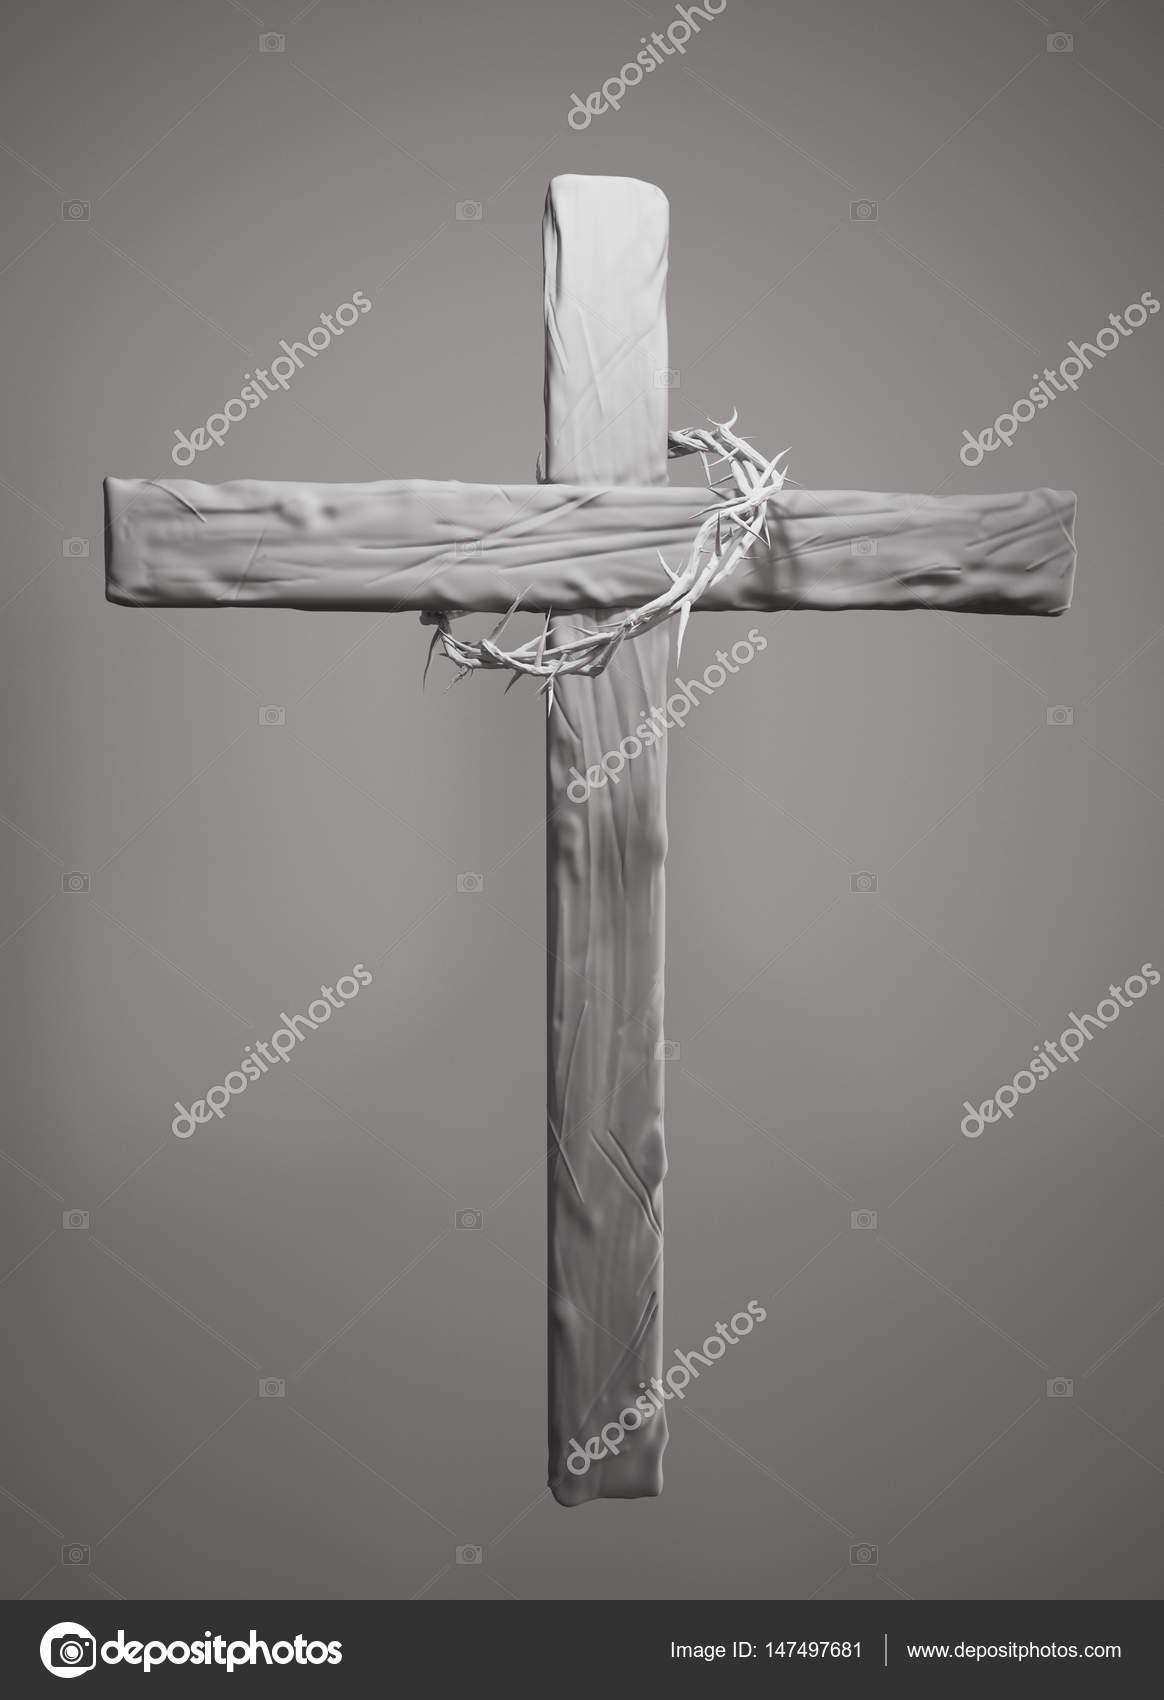 Gambar Salib Paskah : gambar, salib, paskah, Crown, Thorns, Sekitar, Salib, Paskah, Rendering, Natanaelginting, #147497681